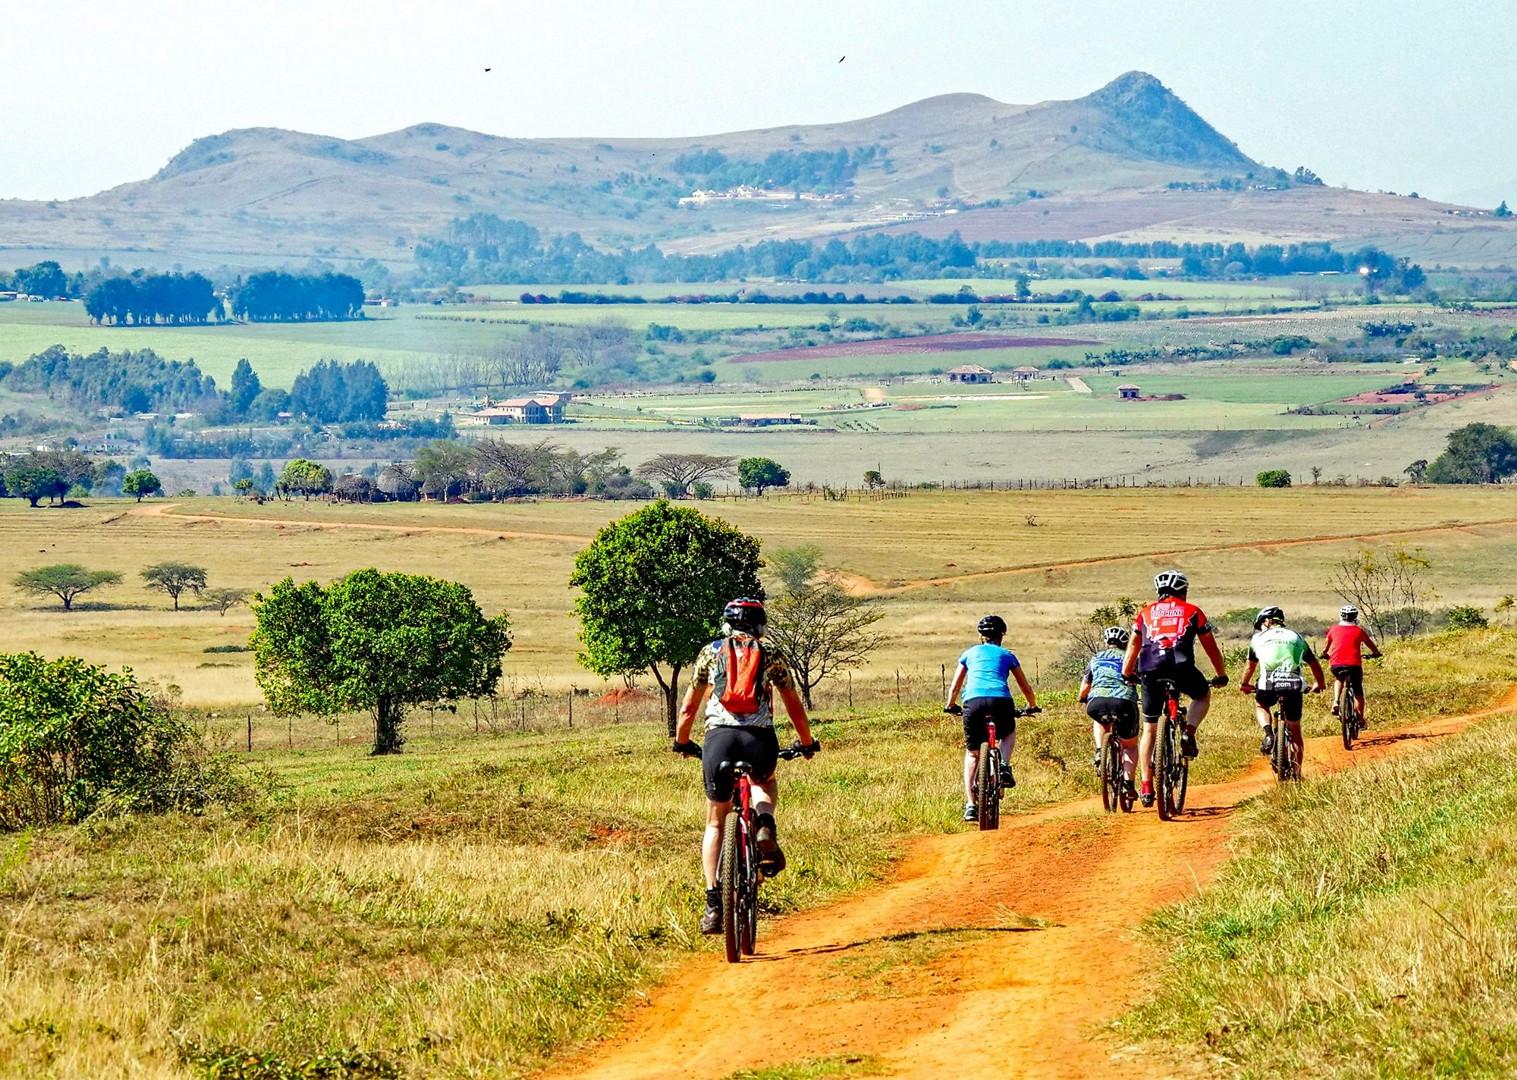 rgfdgfg4.jpg - Eswatini (Swaziland) - Cycling Safari - Cycling Adventures